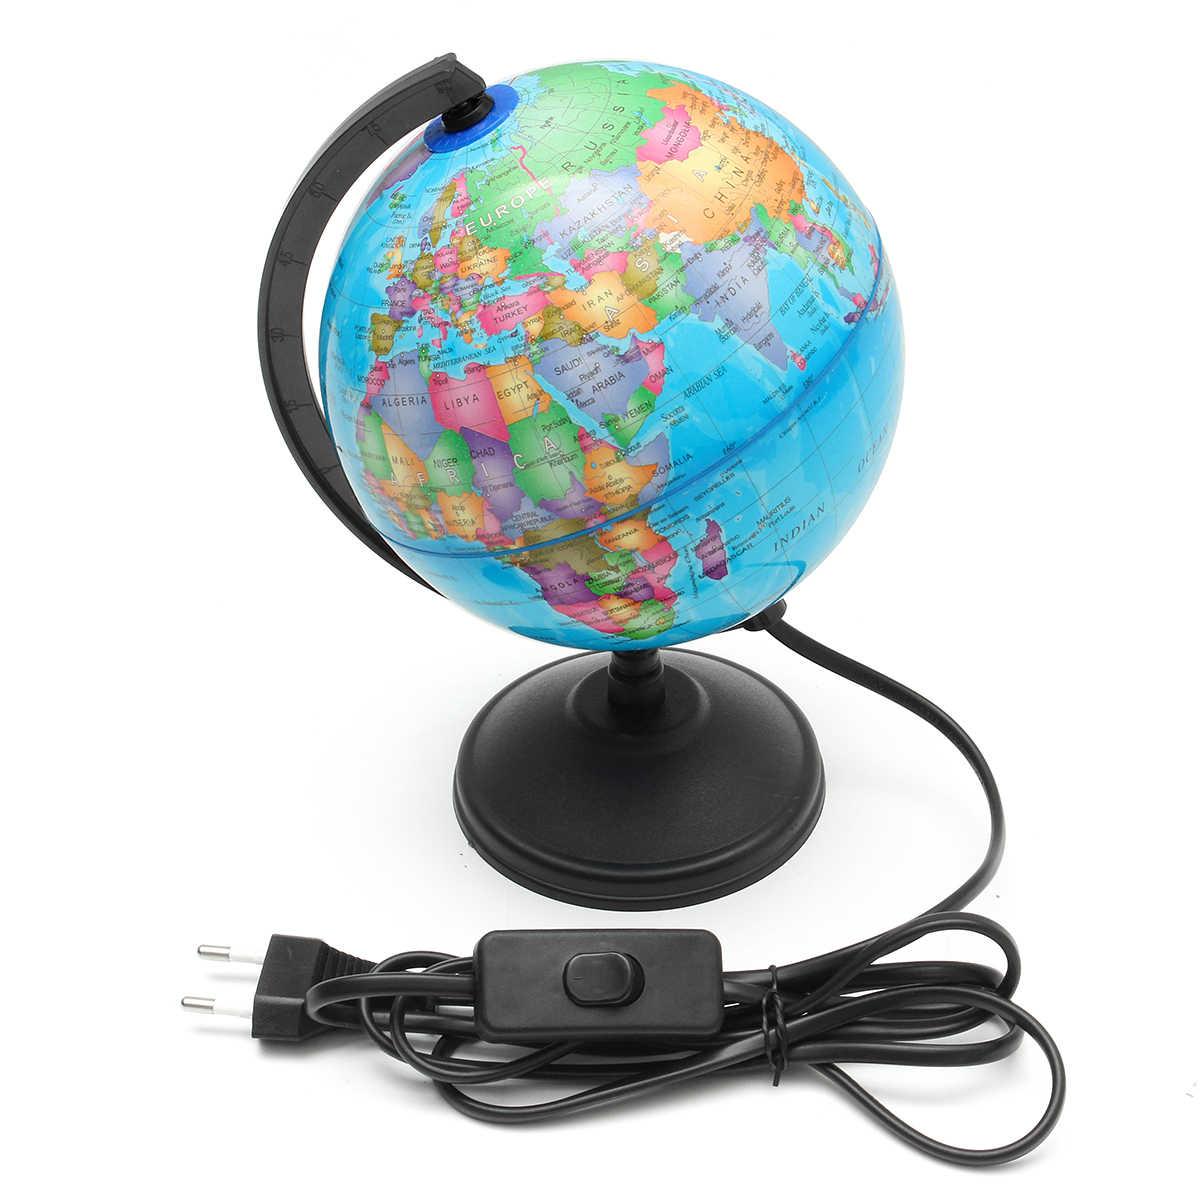 Lampu LED Dunia Bumi Dunia Peta Geografi Pendidikan Mainan dengan Berdiri Rumah Kantor Ideal Miniatur Hadiah Kantor Gadget